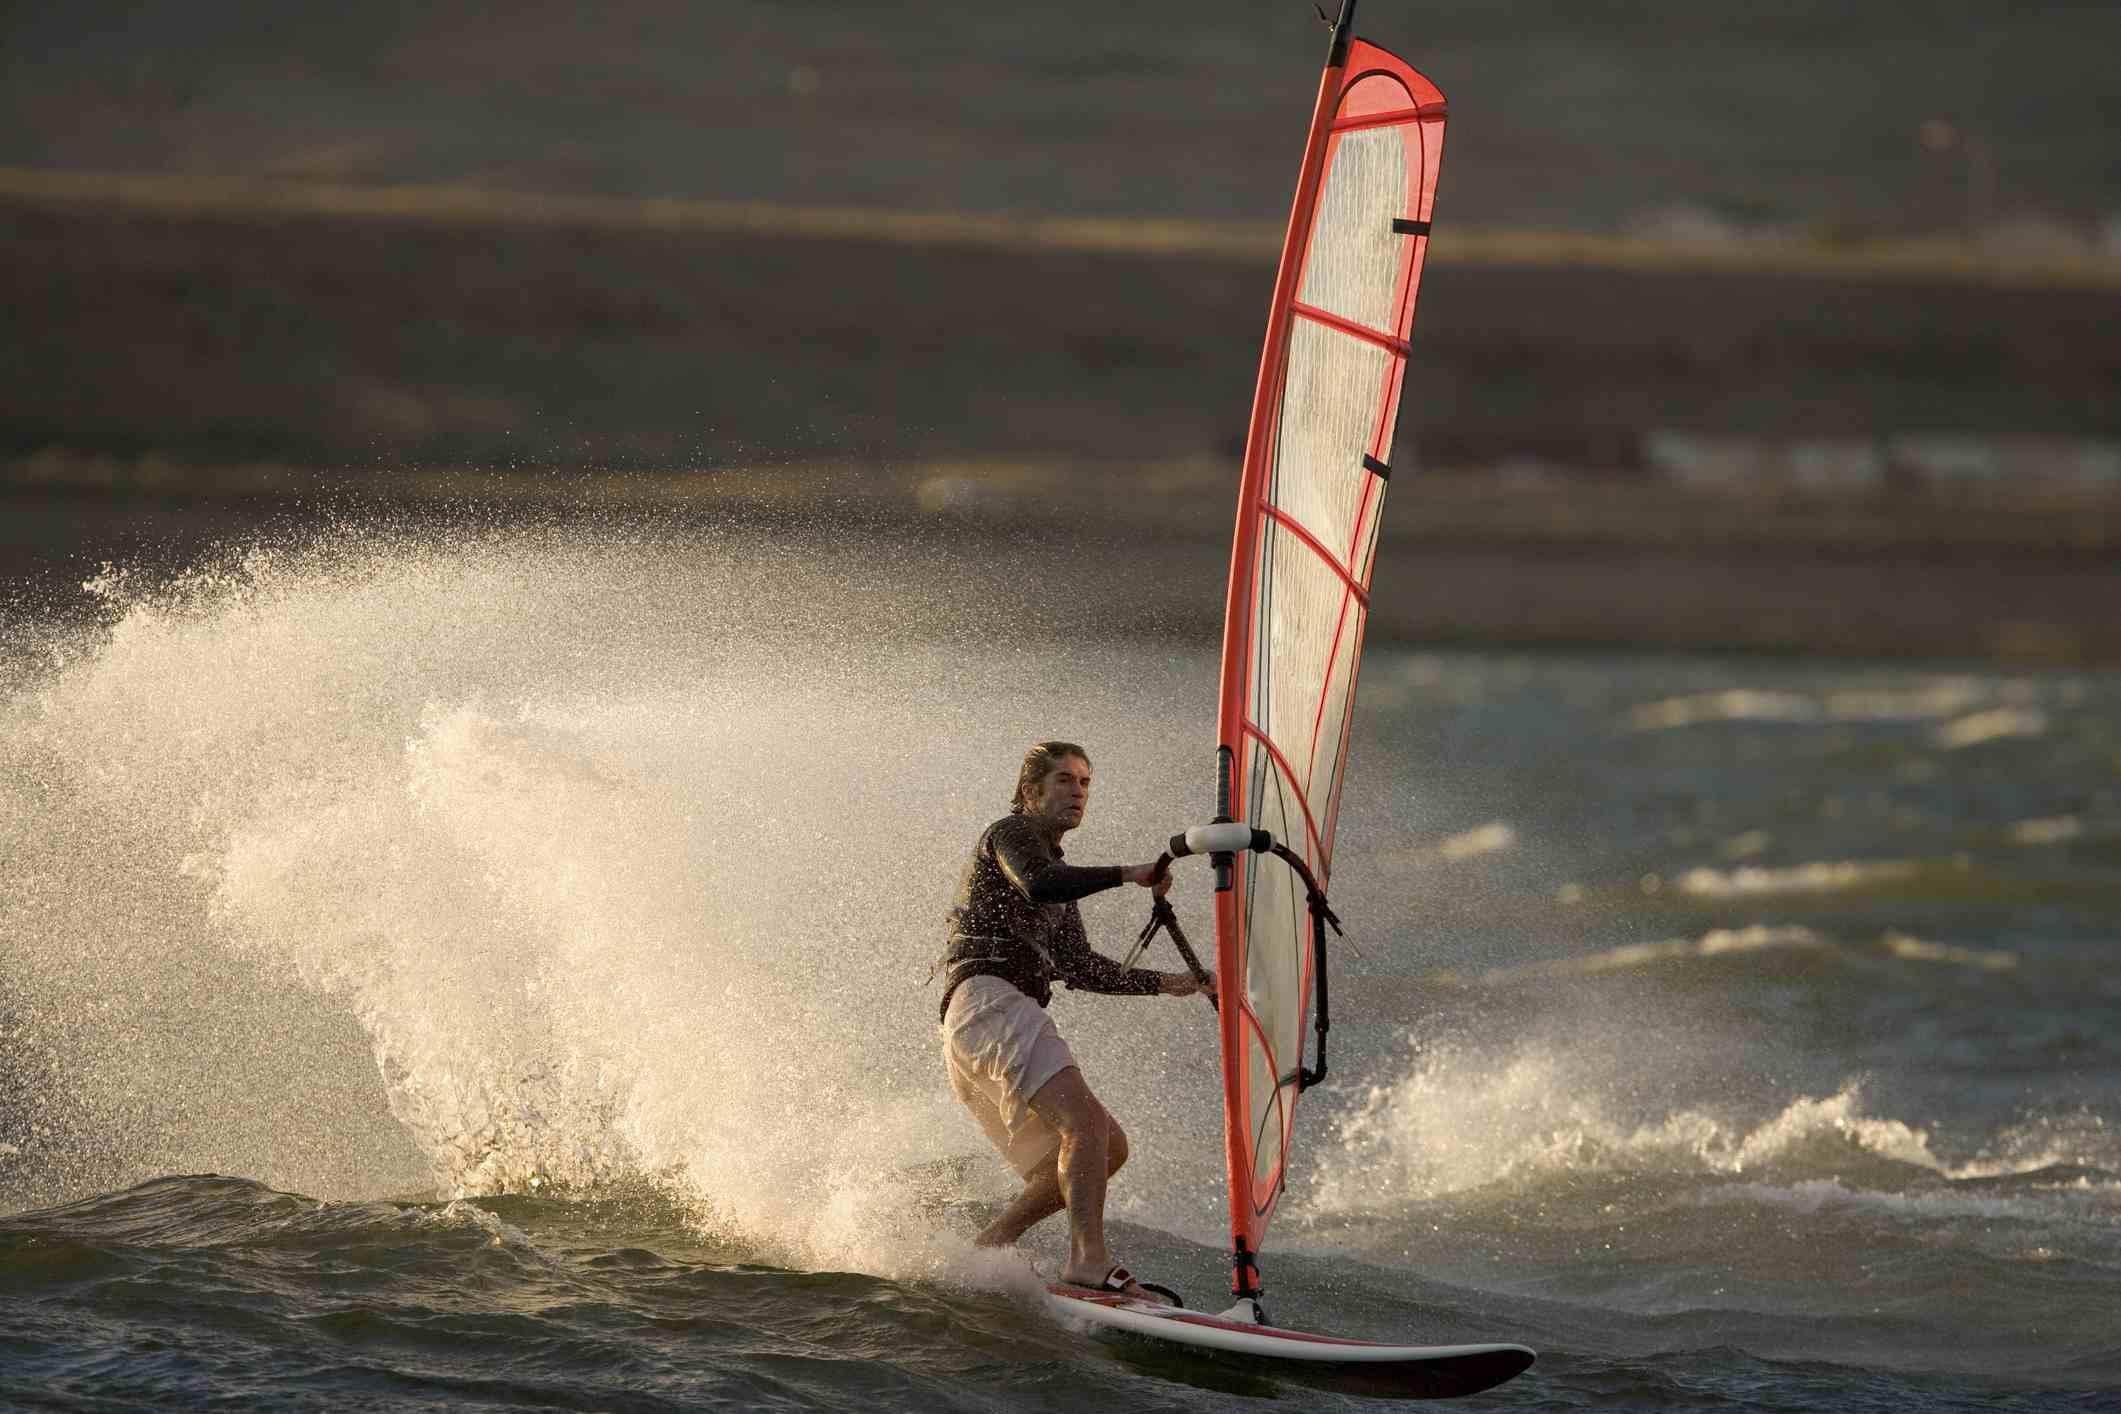 Windsurfer maneuvering through waves.